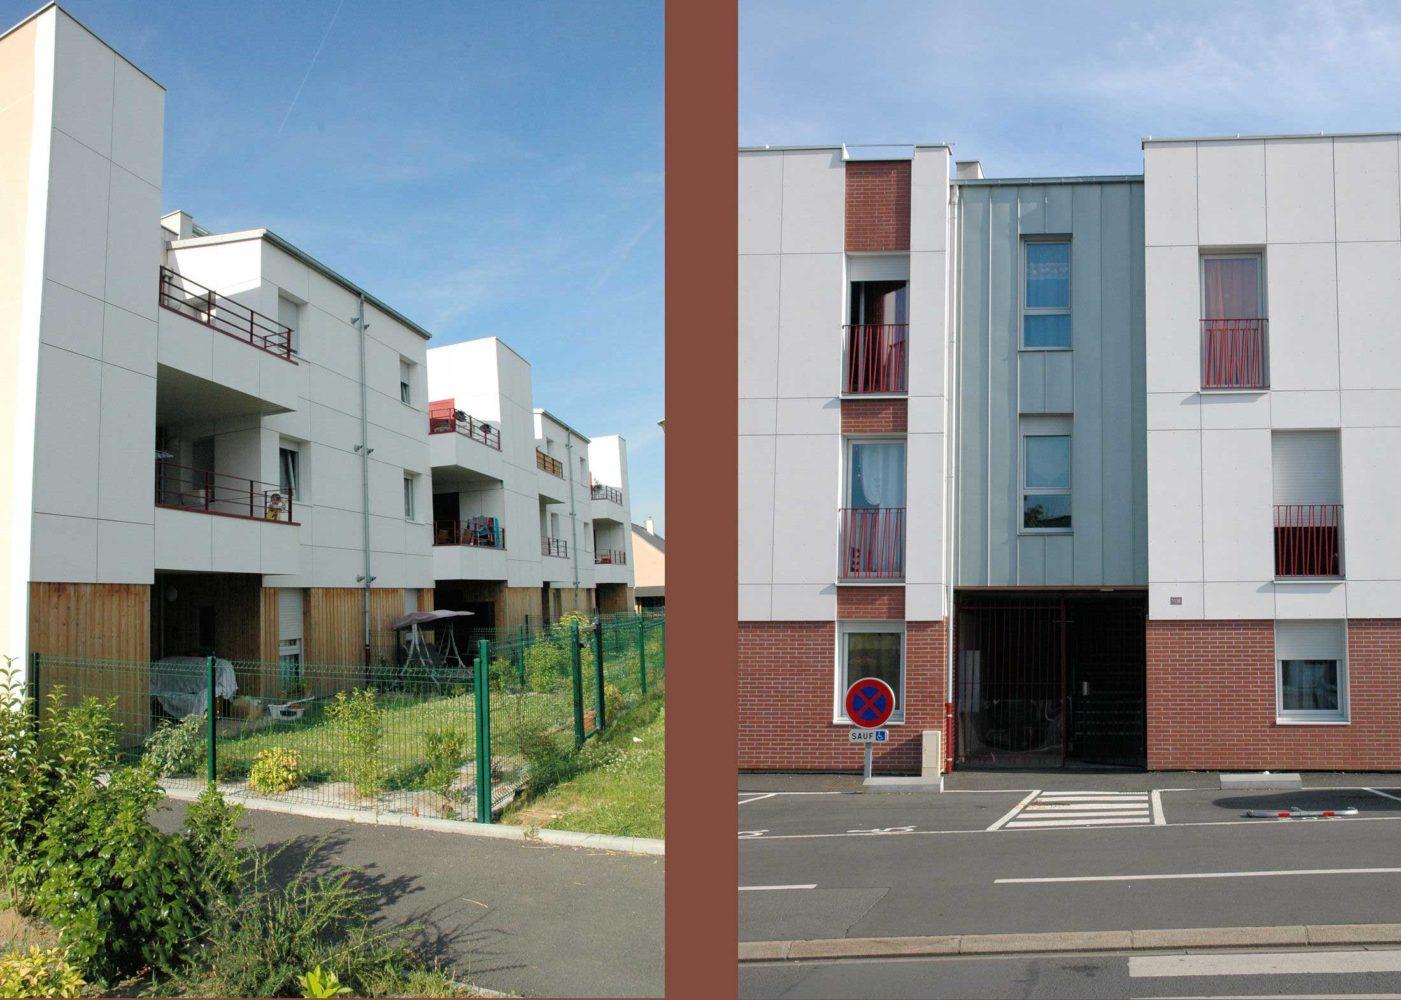 Logements semi-collectifs - résidence Jean Ferrat